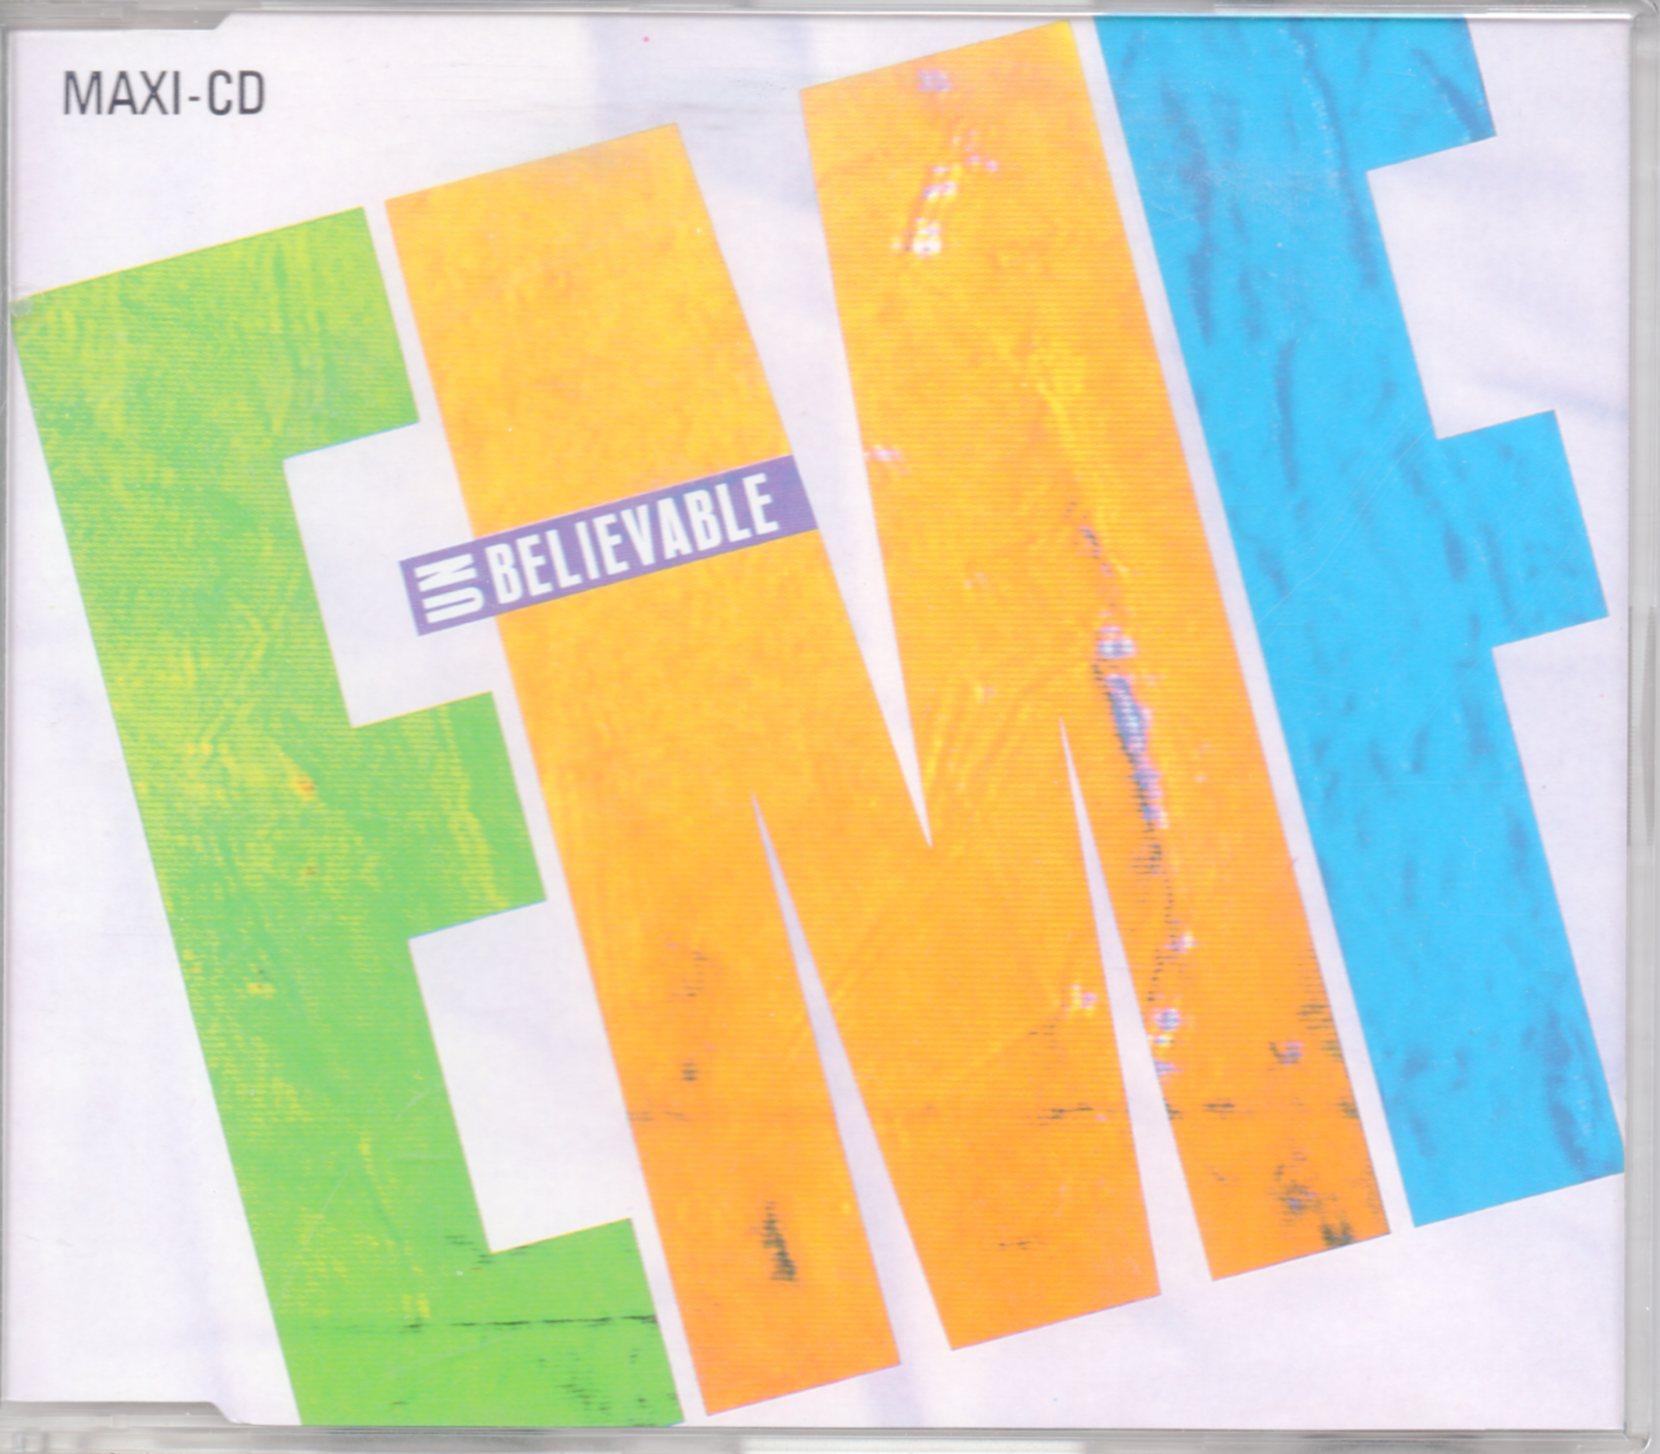 EMF - Unbelievable 3-Track jewel case - CD Maxi